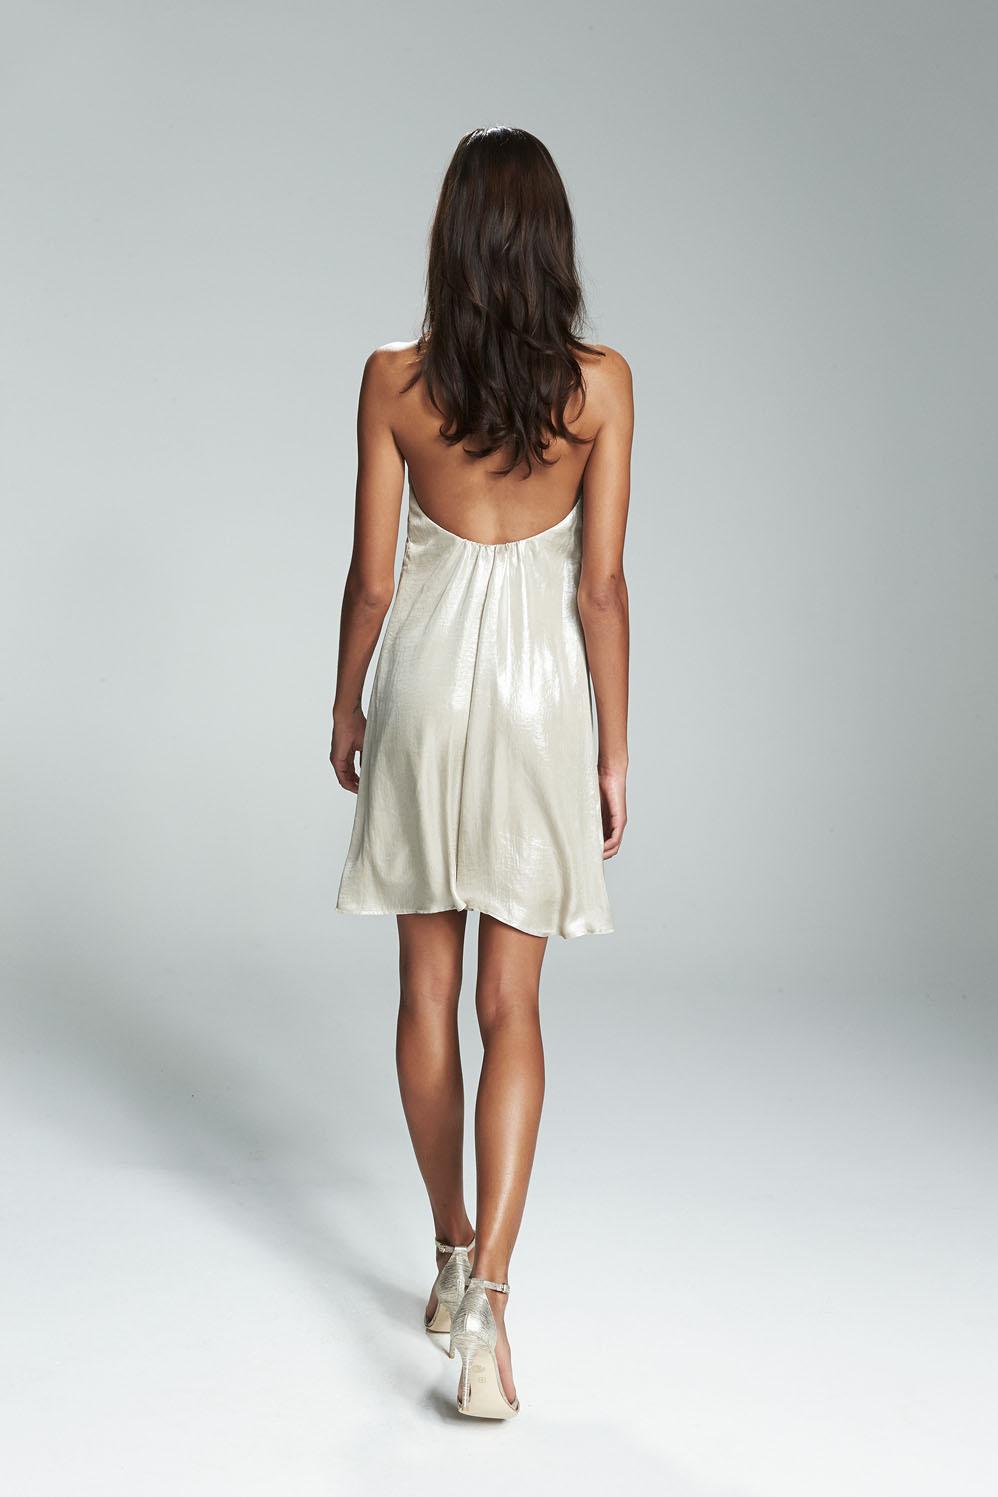 Short-shimmer-bridesmaid-dresses-nouvelle-amsale-bridesmaids-deidre-2.jpg